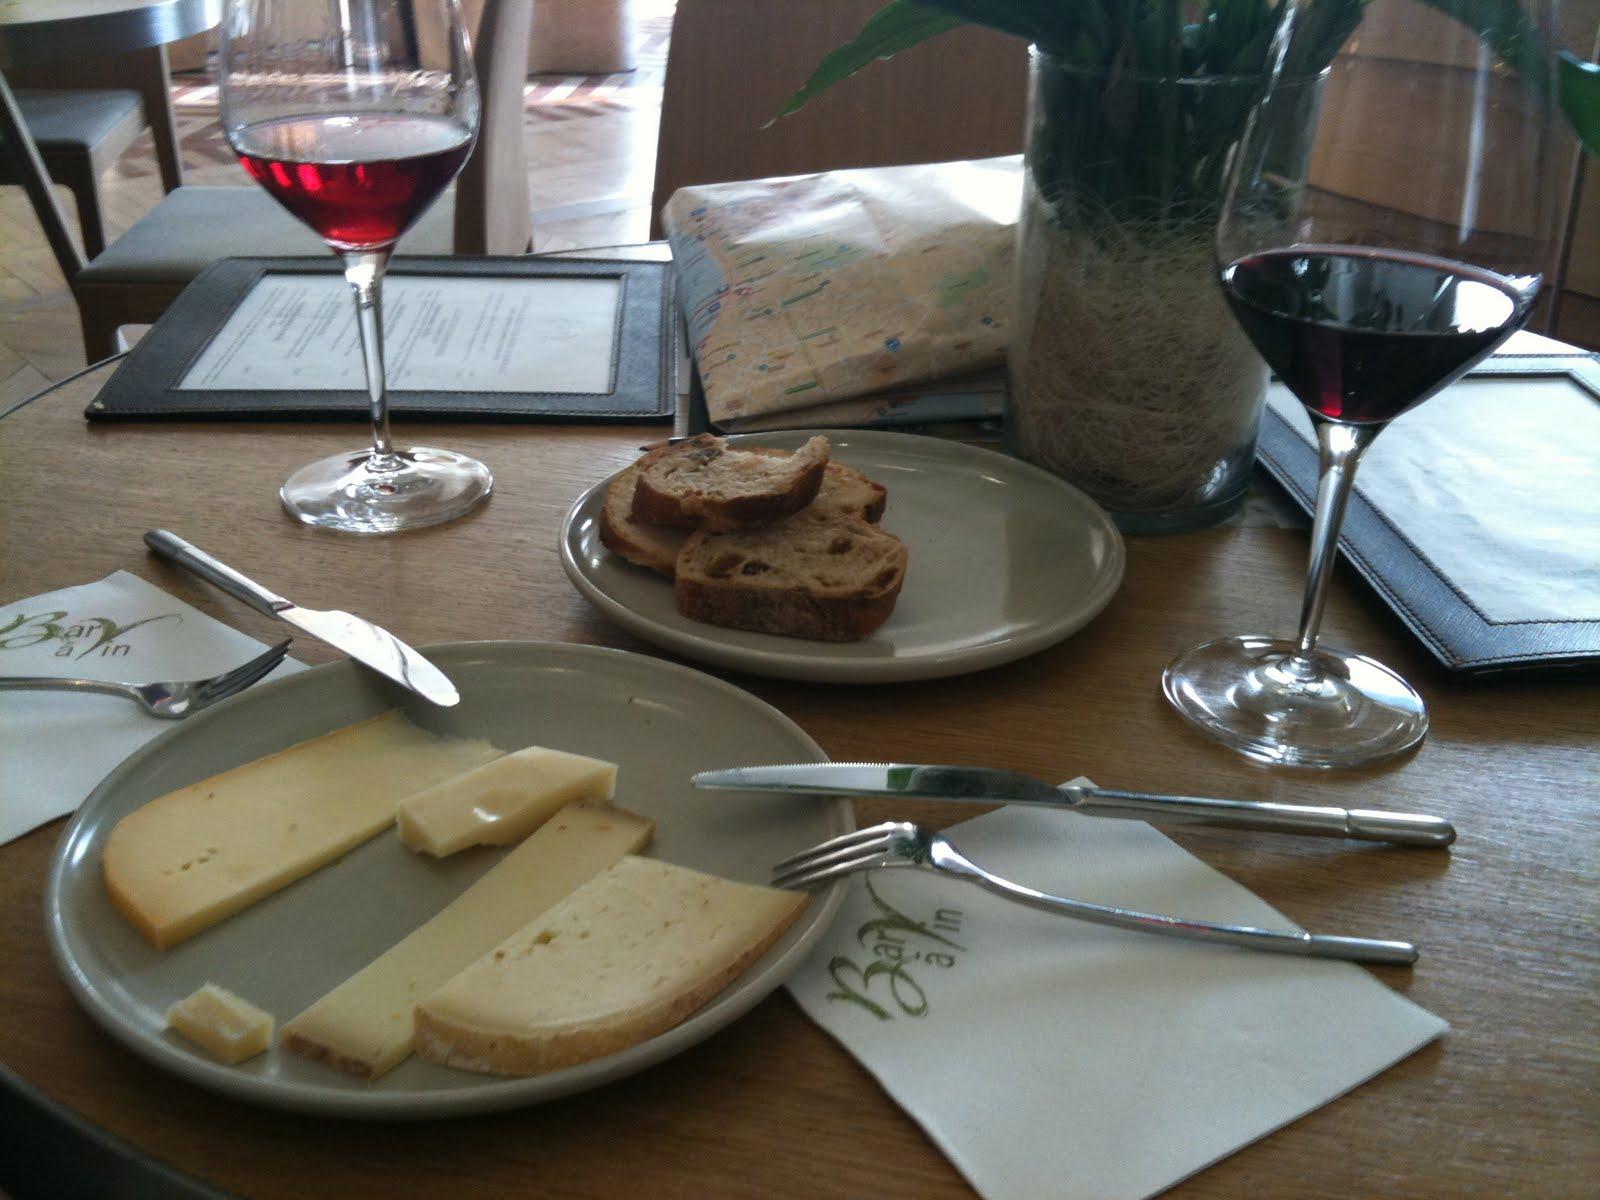 aime voyager - dicas pra bon vivant !: Santè ... Bordeaux !!!! J ...